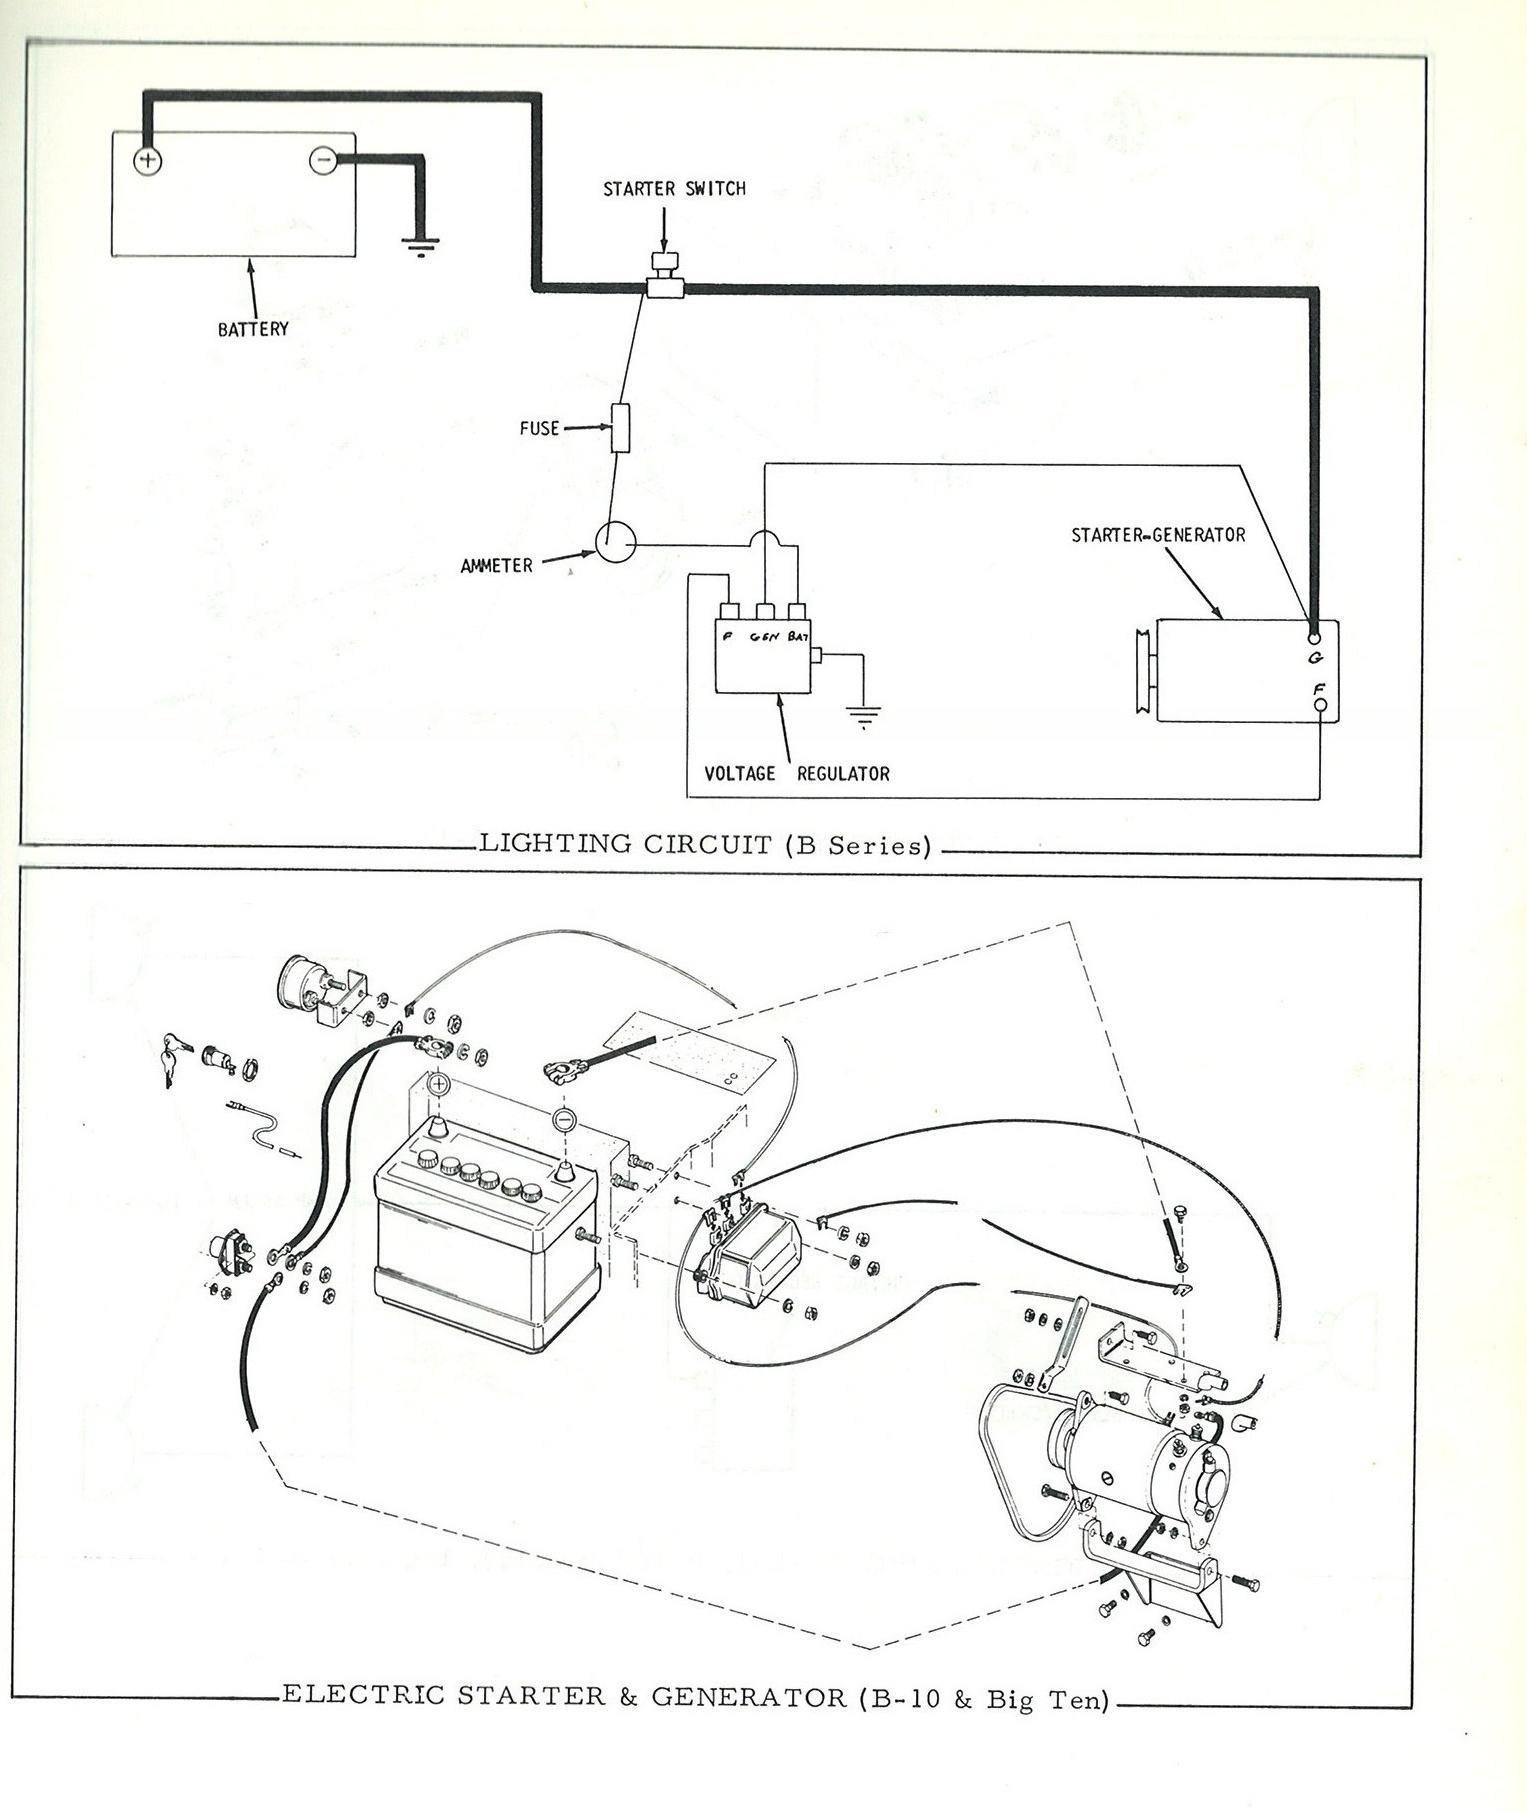 Fantastic 36 Volt Melex Wiring Diagram Pictures - Electrical Diagram ...